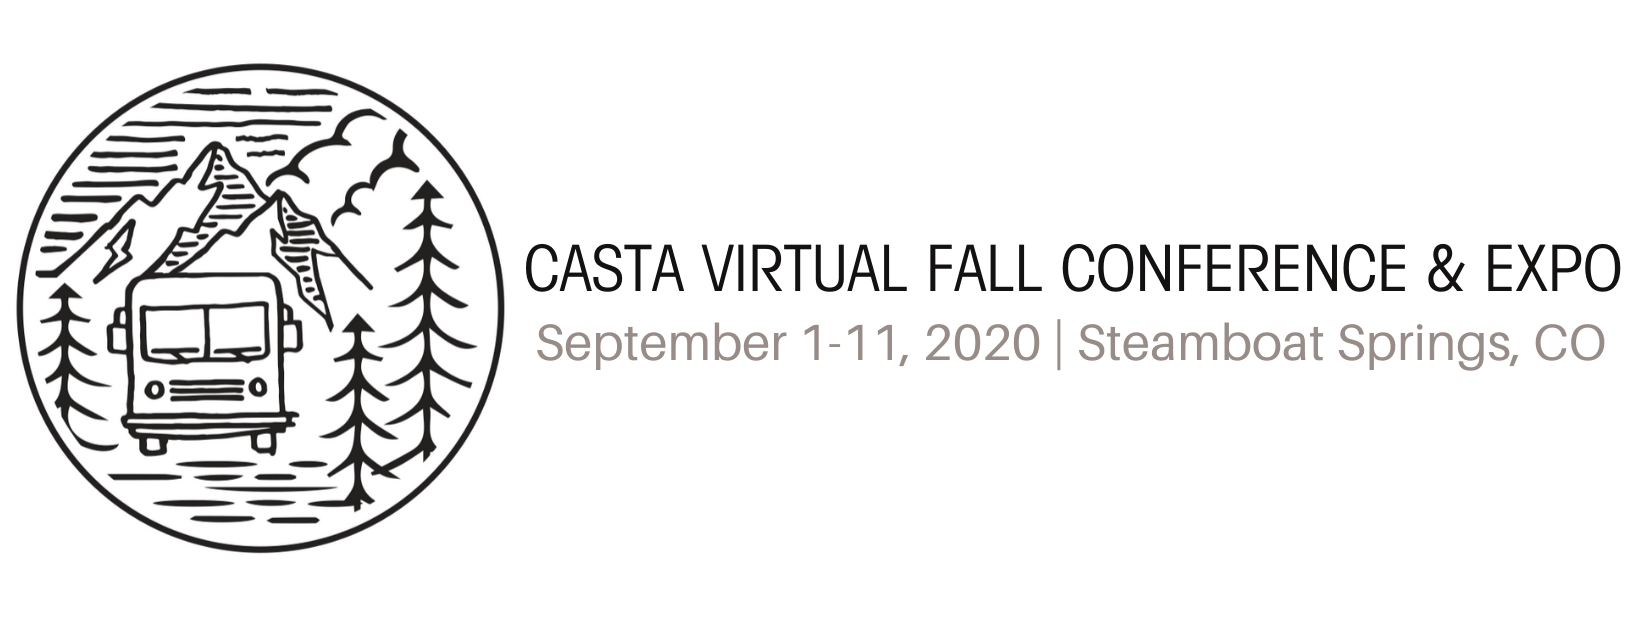 2020 virtual casta cdot fall transit conference expo casta 2020 virtual casta cdot fall transit